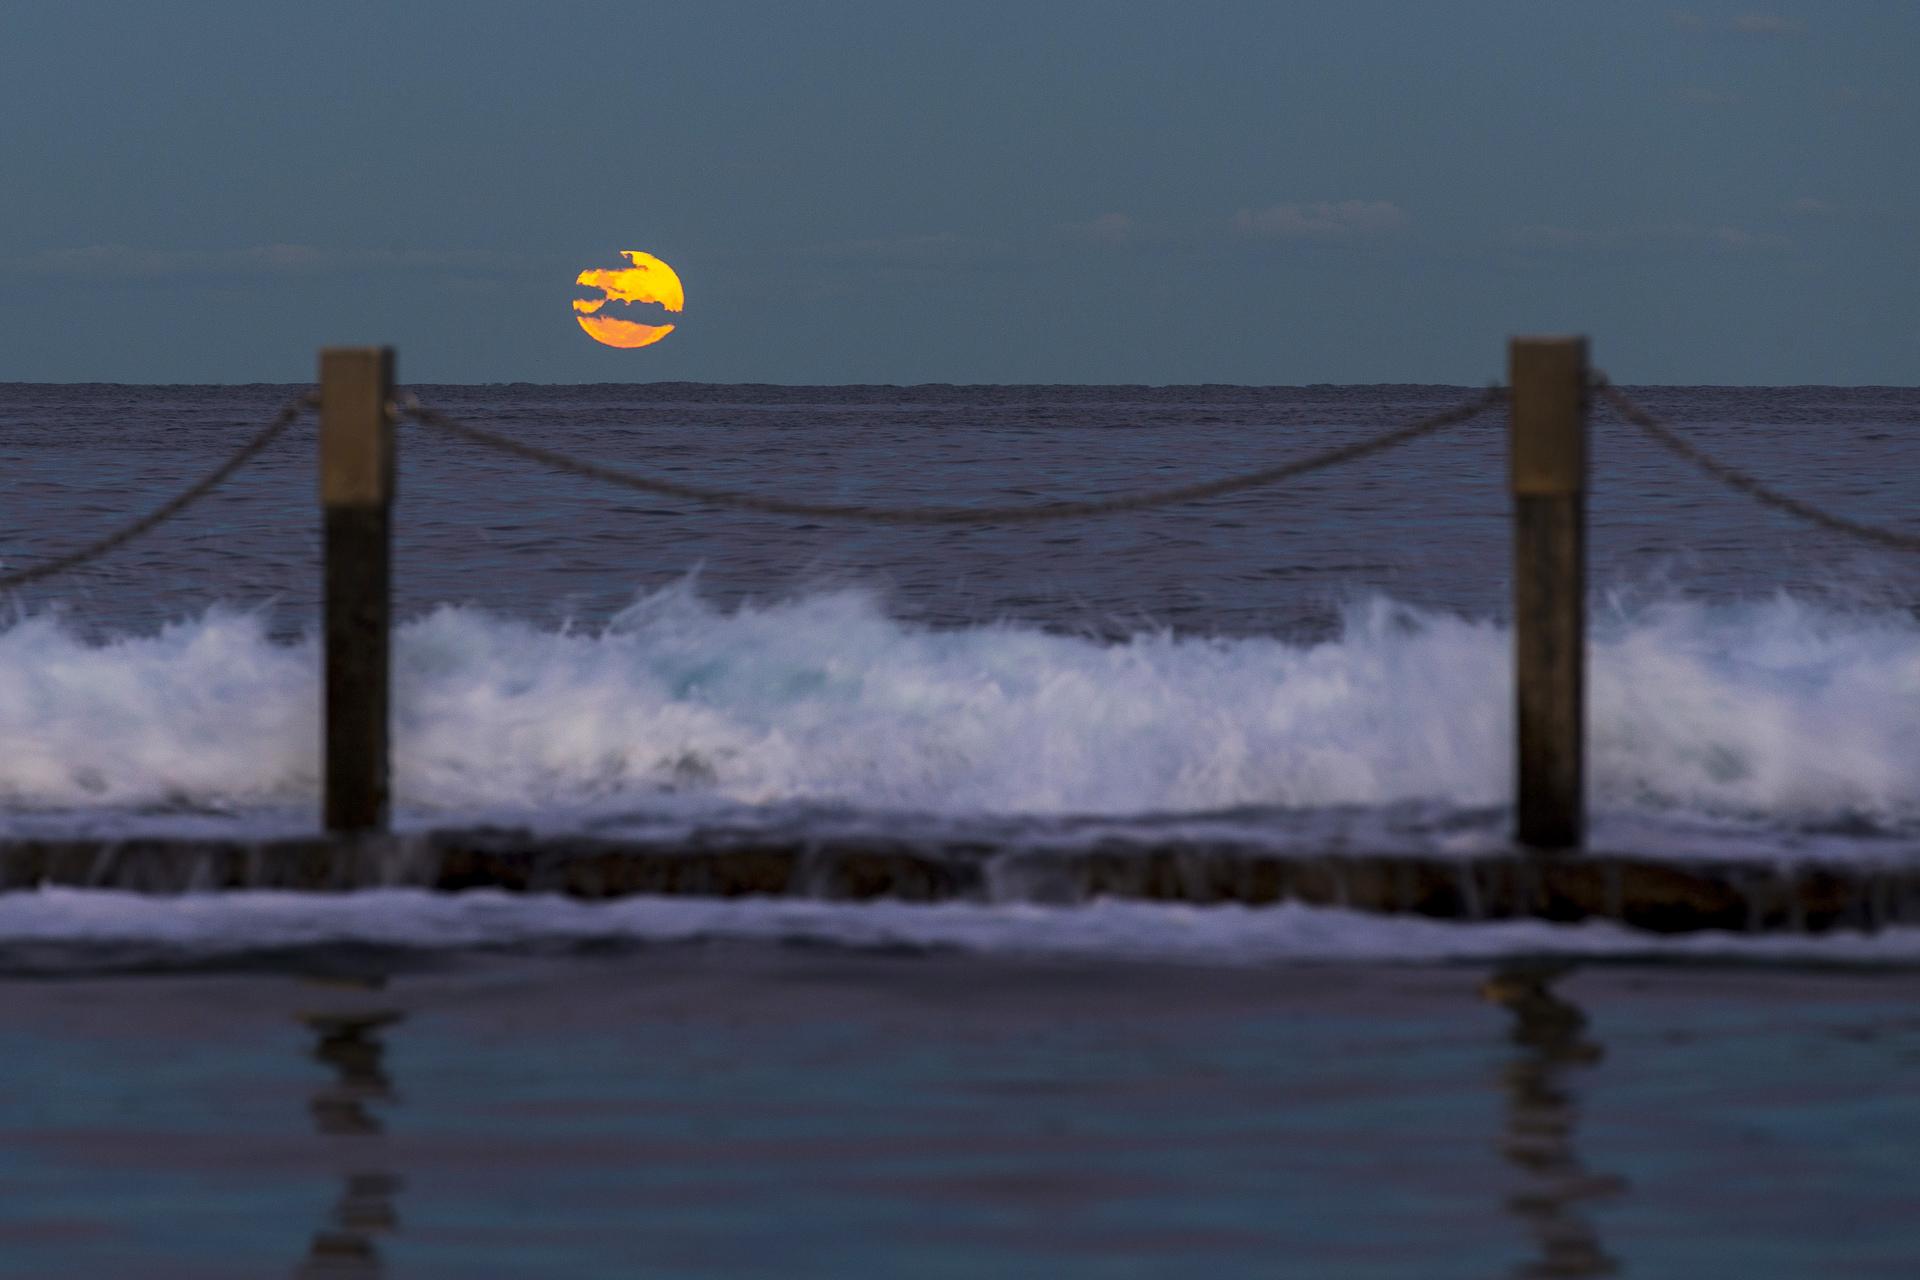 Sydney landscape photographer, sunrise, sunset, ocean, ocean pool, landscape, award winning, travel, NSW, Australia, sea, fine art prints, While you were sleeping, Mahon, Maroubra, moon